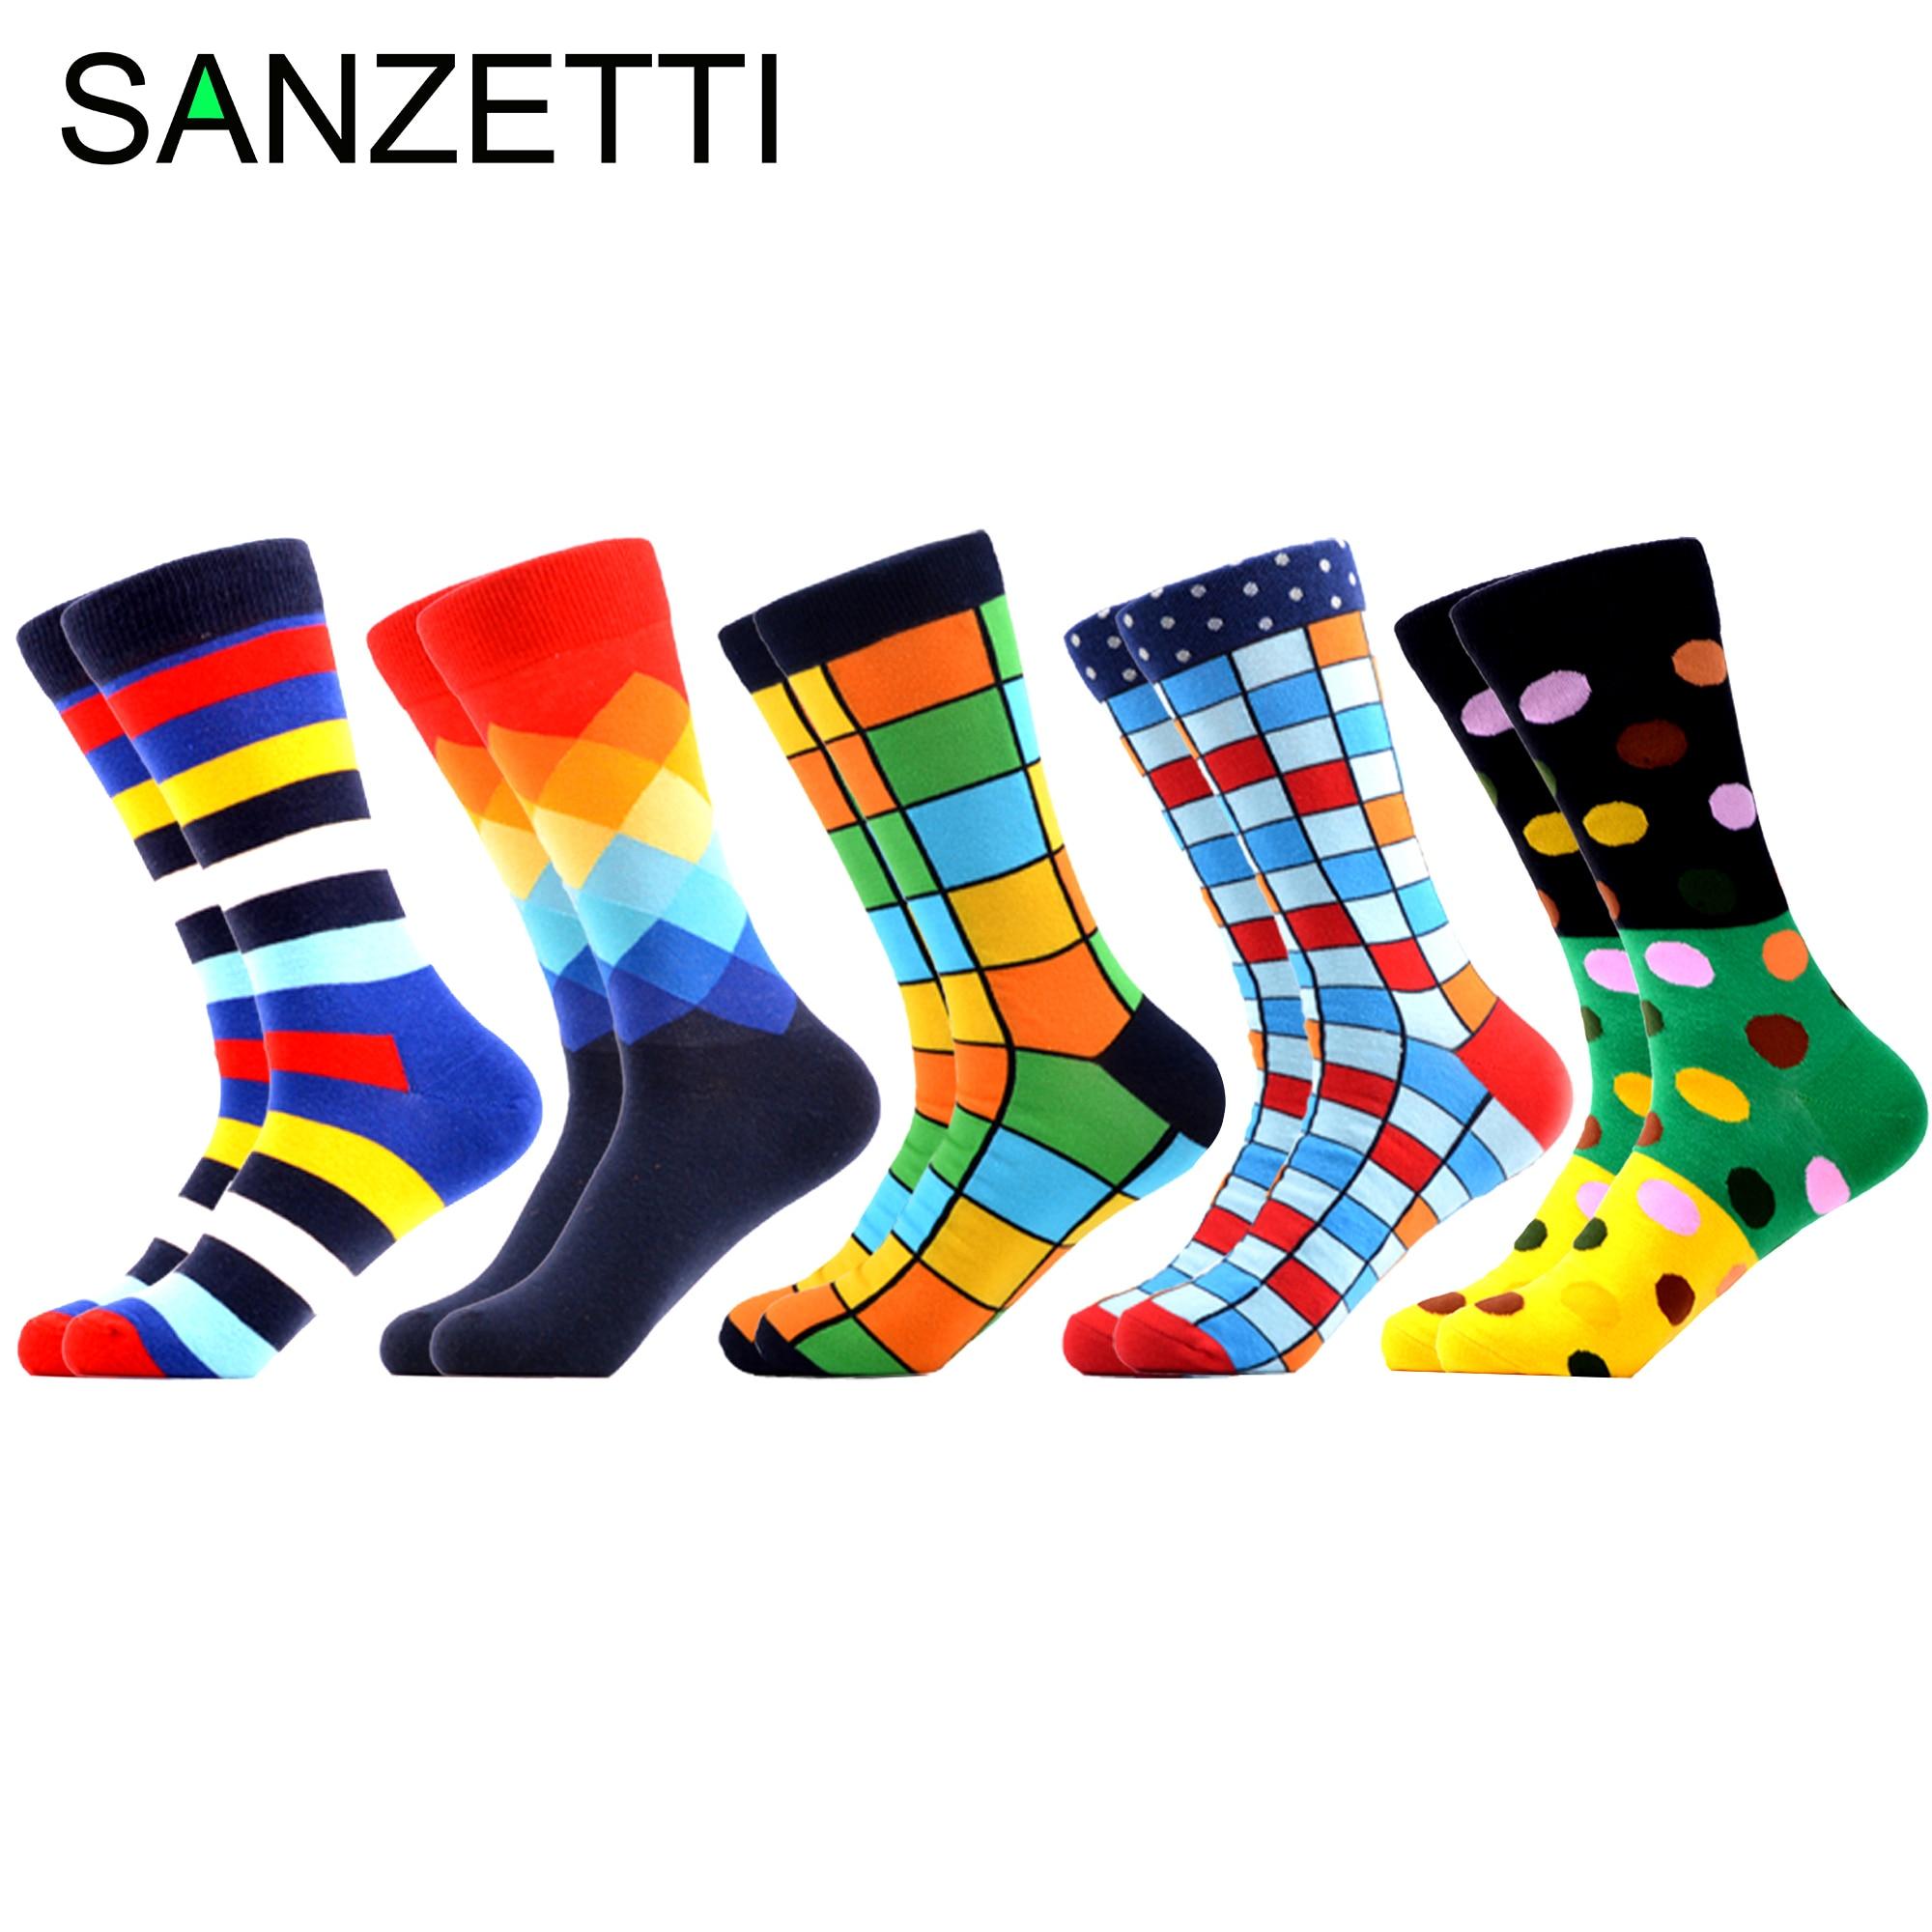 SANZETTI Colorful Men Funny Combed Cotton Tube   Socks   Dress Tend Hip Hop Novelty Street Skate Crew   Socks   Wedding Happy Gift   Socks